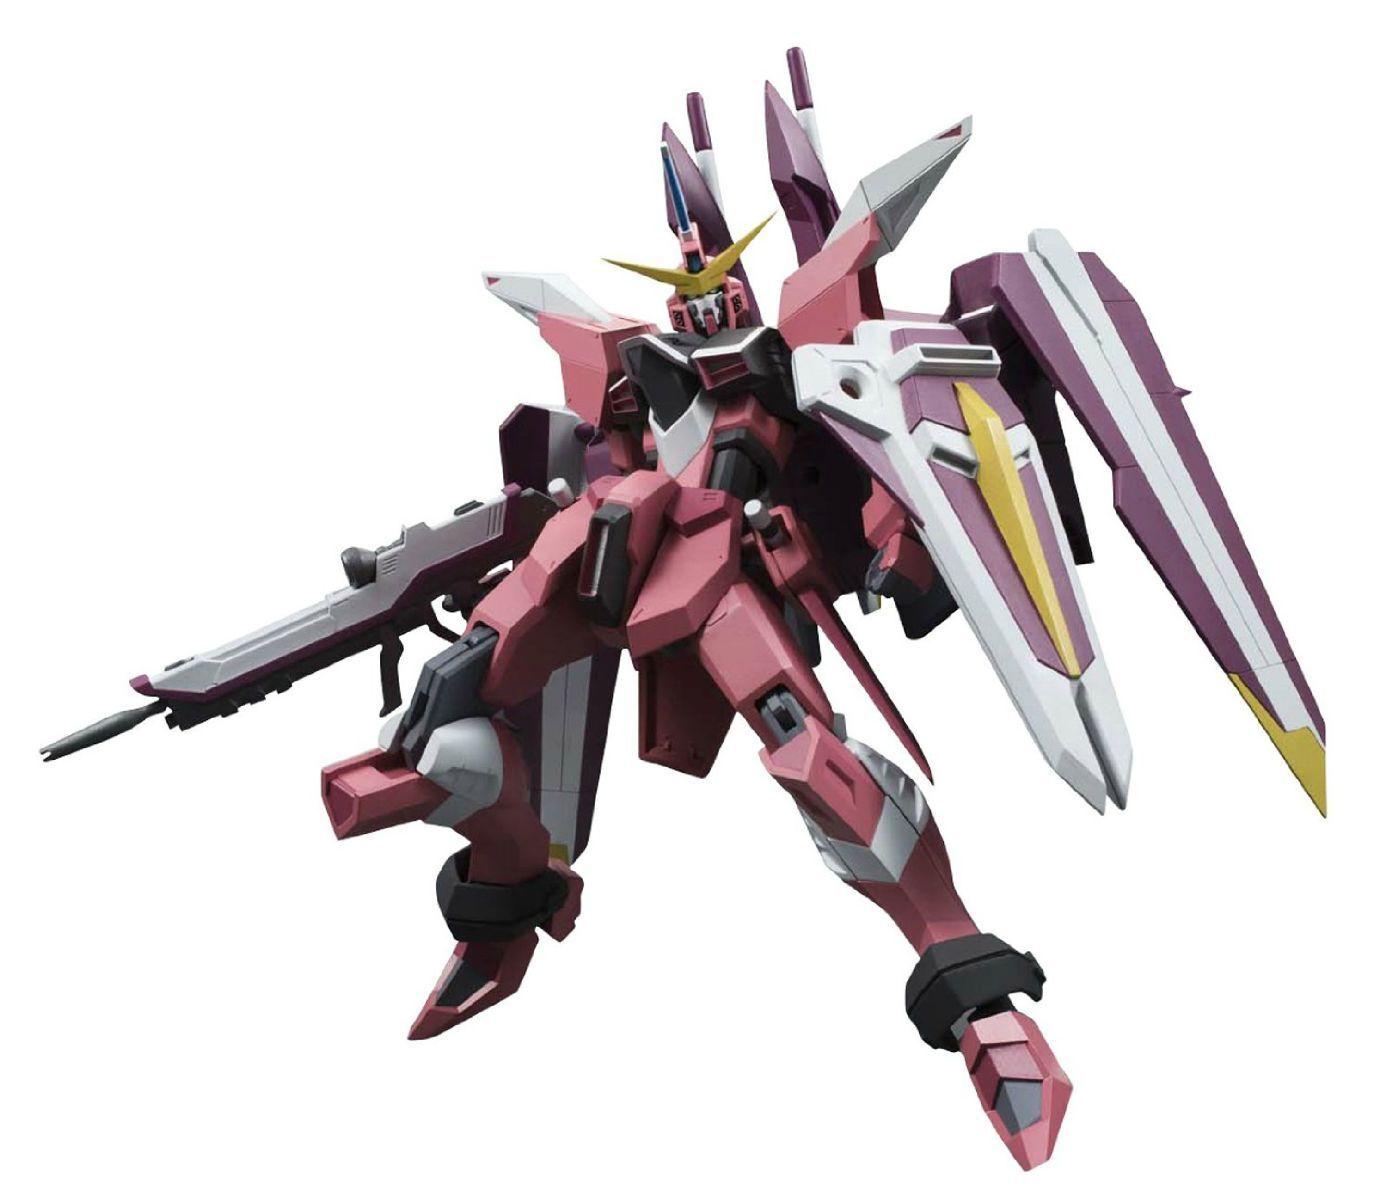 ROBOT SPIRITS  Side MS Gundam SEED JUSTICE GUNDAM azione cifra BeAI from Japan  wholesape economico